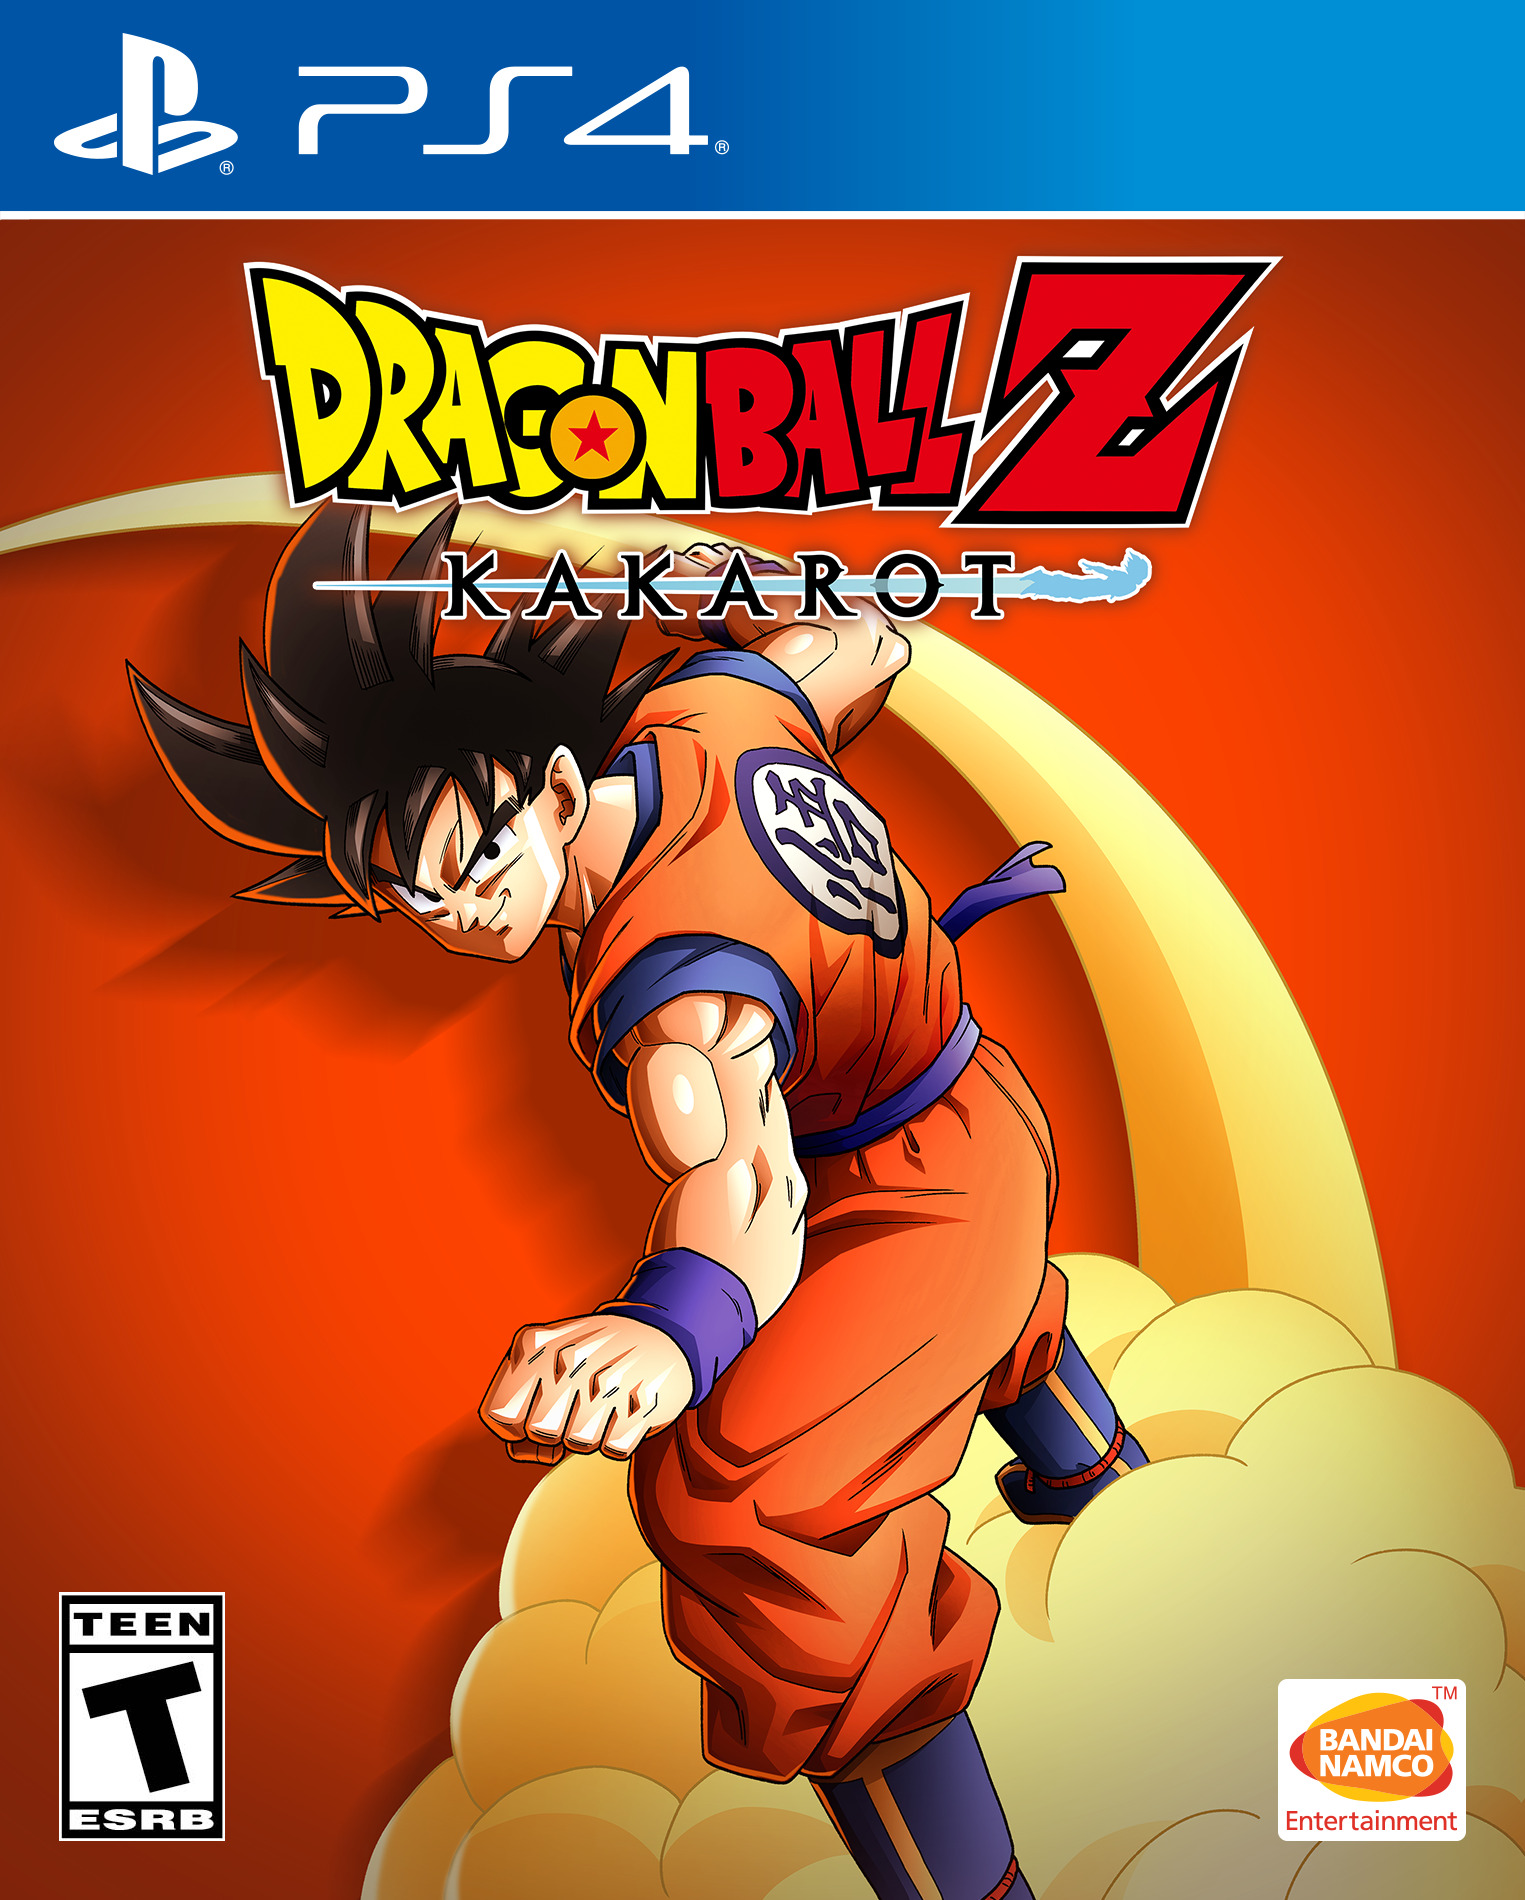 Dragon Ball Z Kakarot Bandai Namco Playstation 4 722674121668 Walmart Com Walmart Com